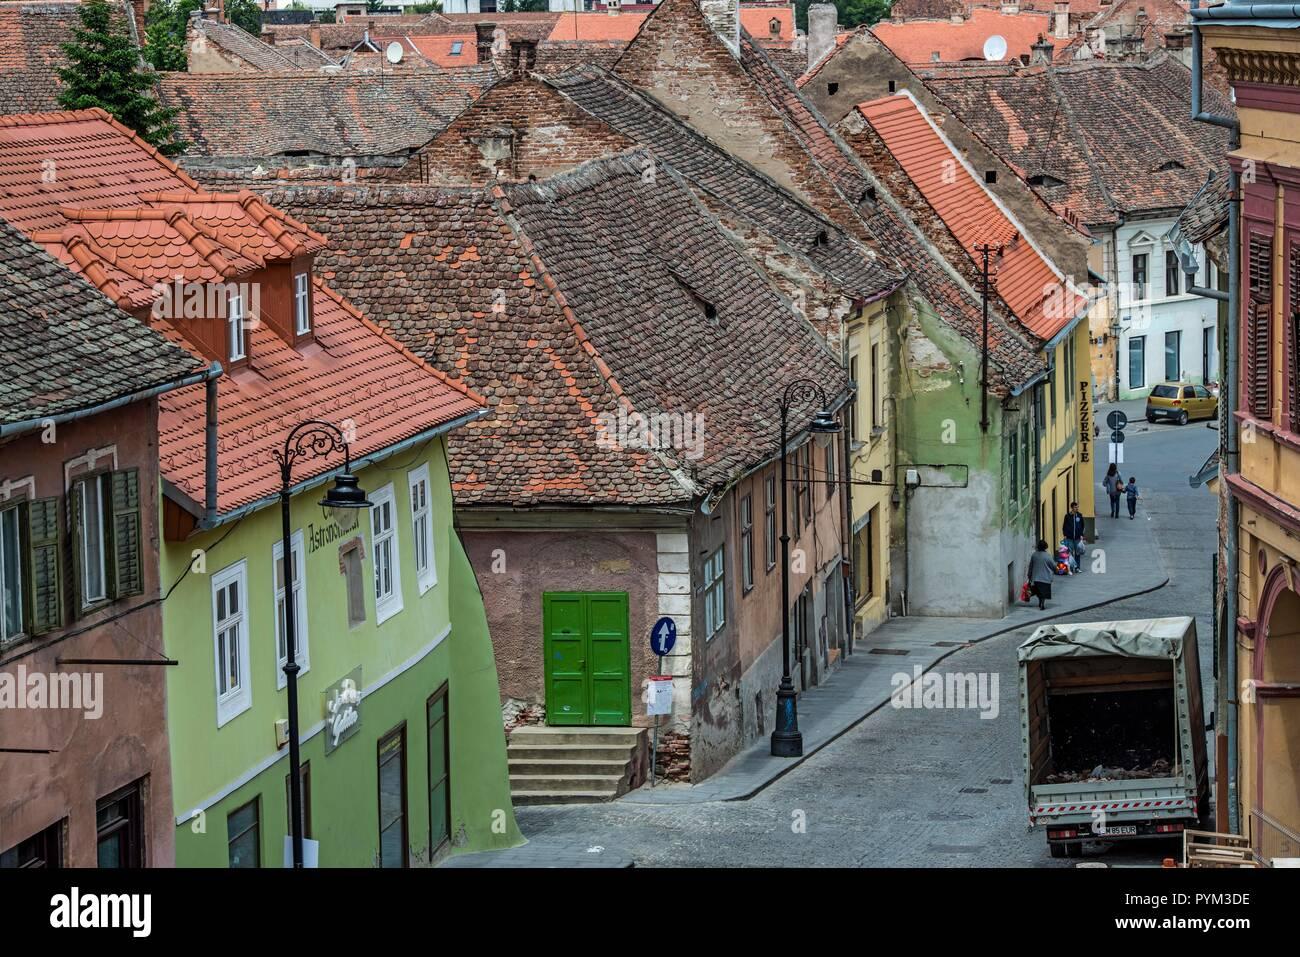 ROMANIA, SIBIU. Parts of the historic old town still need a bit refurbishing - Stock Image